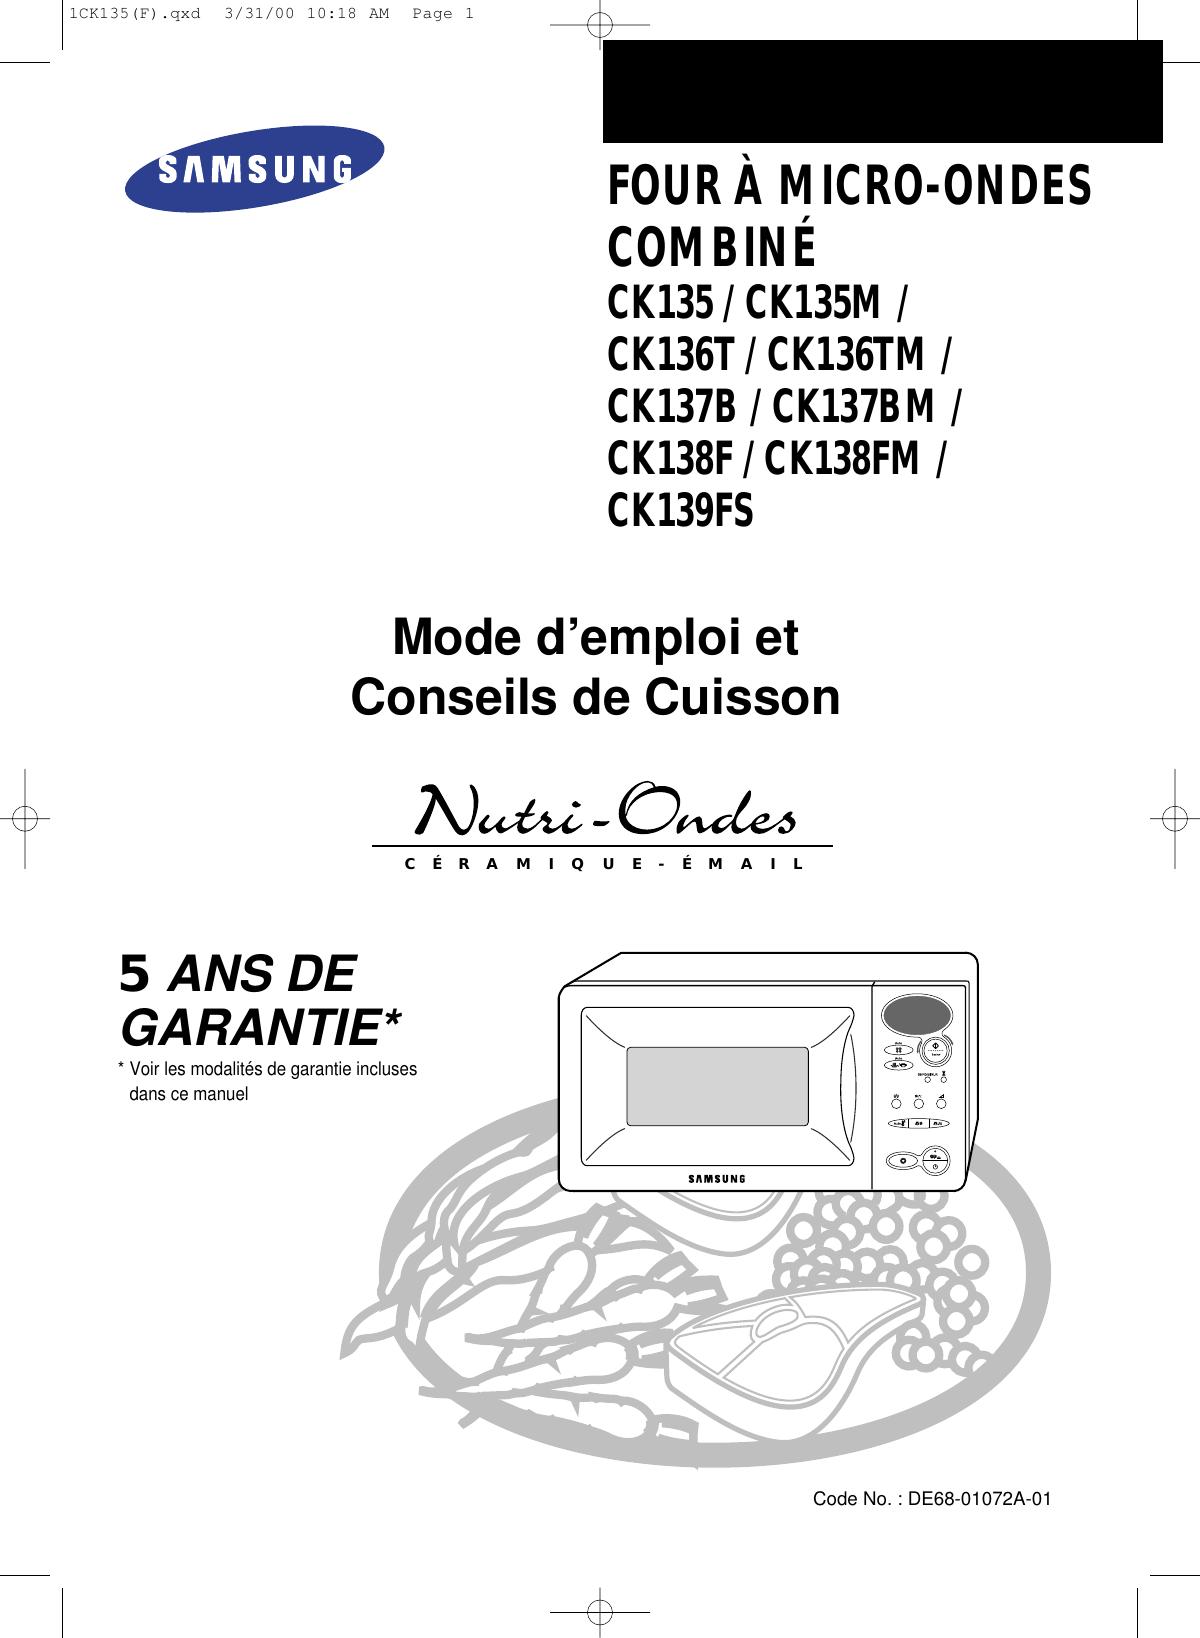 Four Combine Samsung Mode Demploi